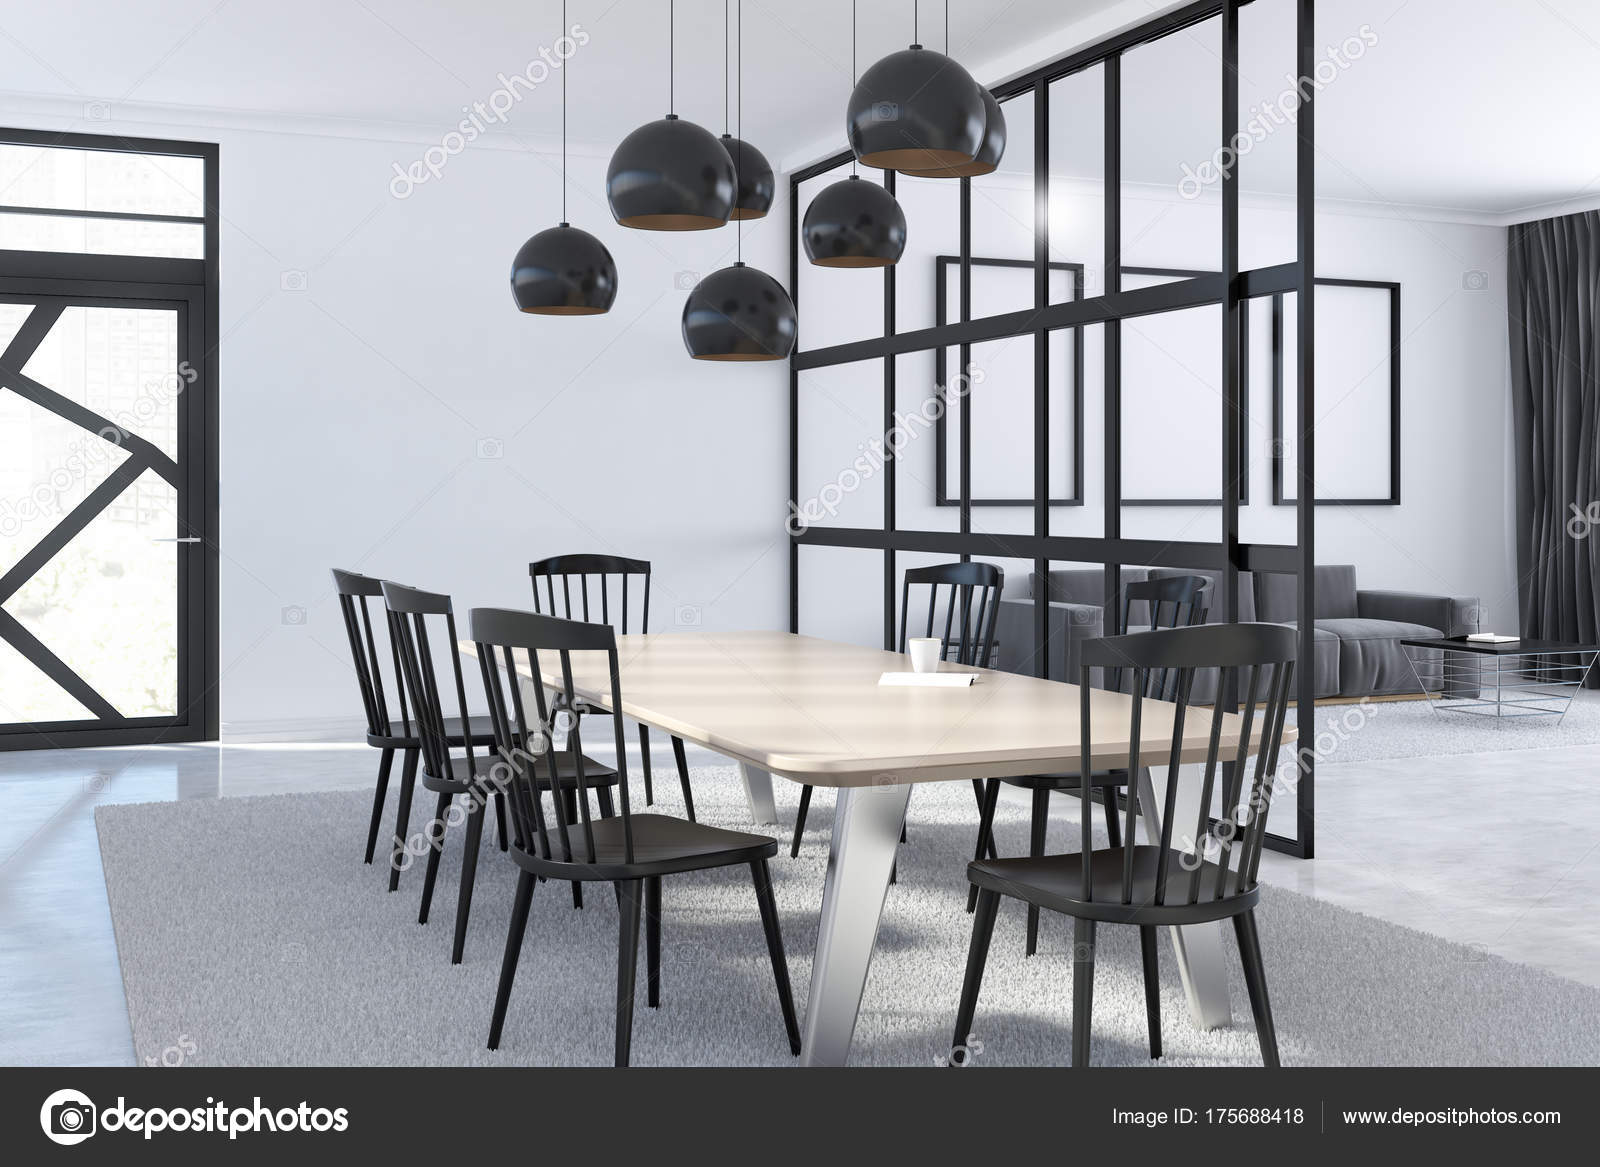 Eetkamer wit interieur — Stockfoto © denisismagilov #175688418